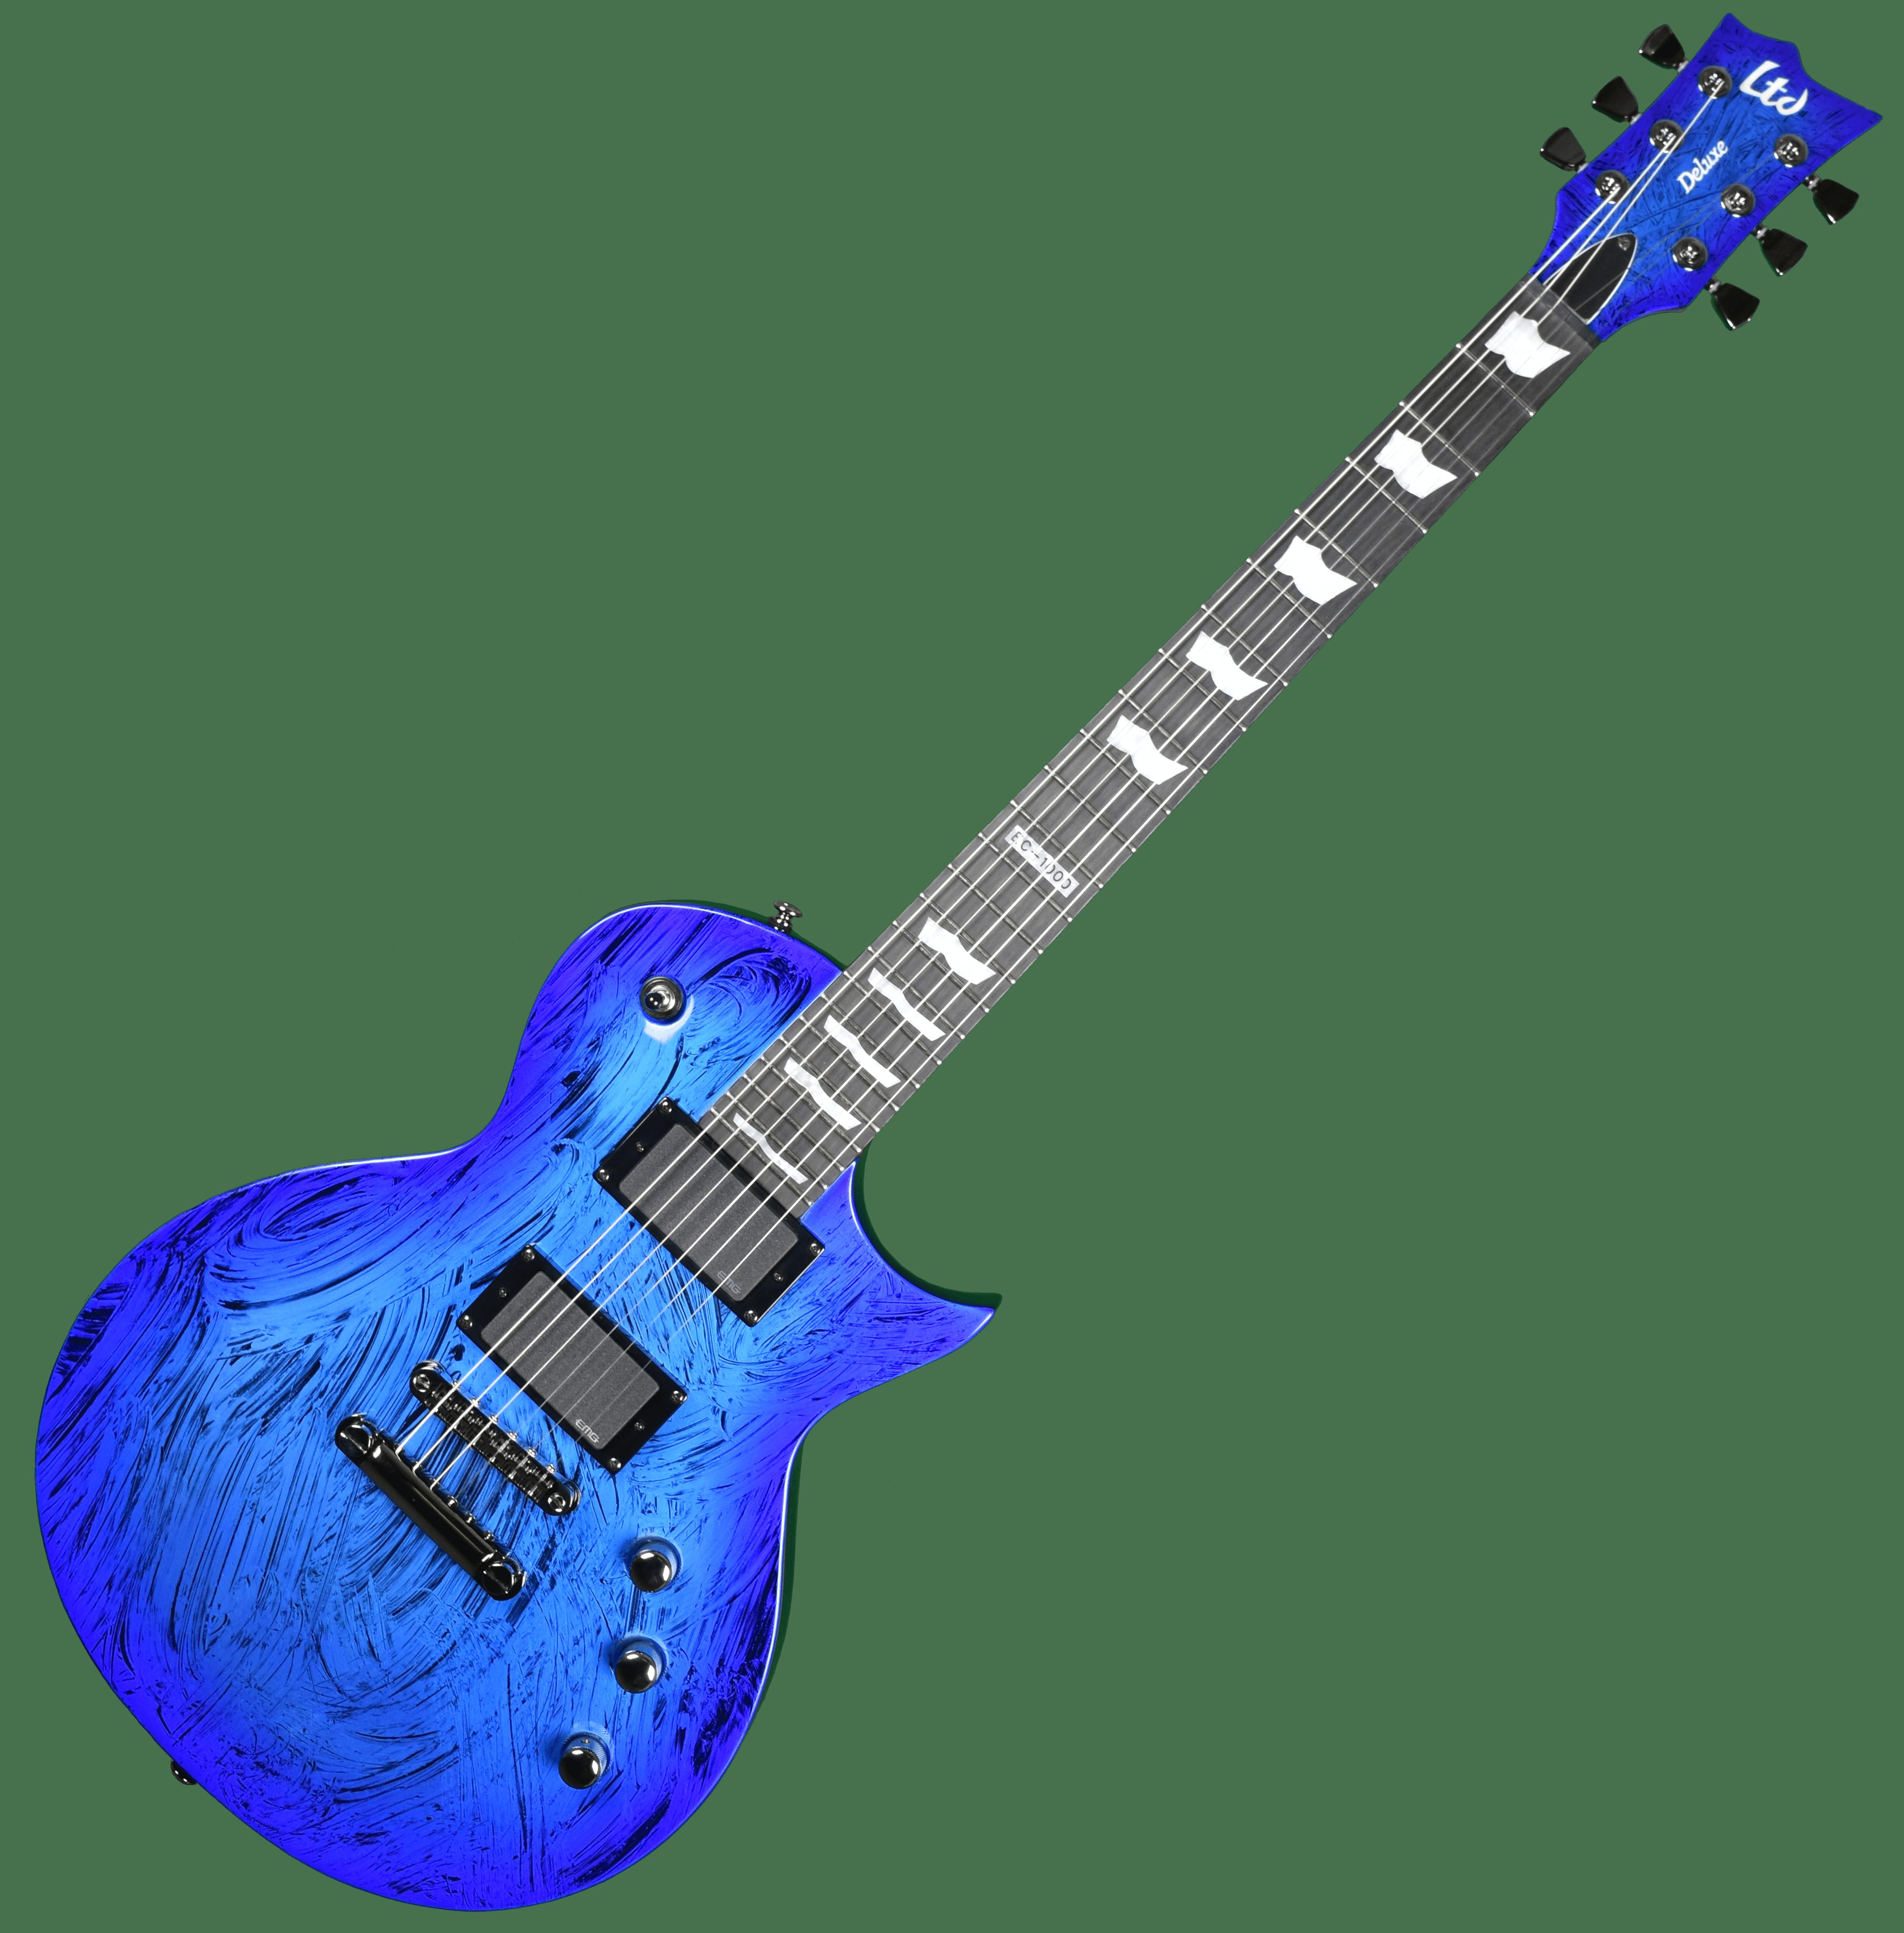 esp ltd deluxe ec 1000 electric guitar in swirl blue finish ebay. Black Bedroom Furniture Sets. Home Design Ideas